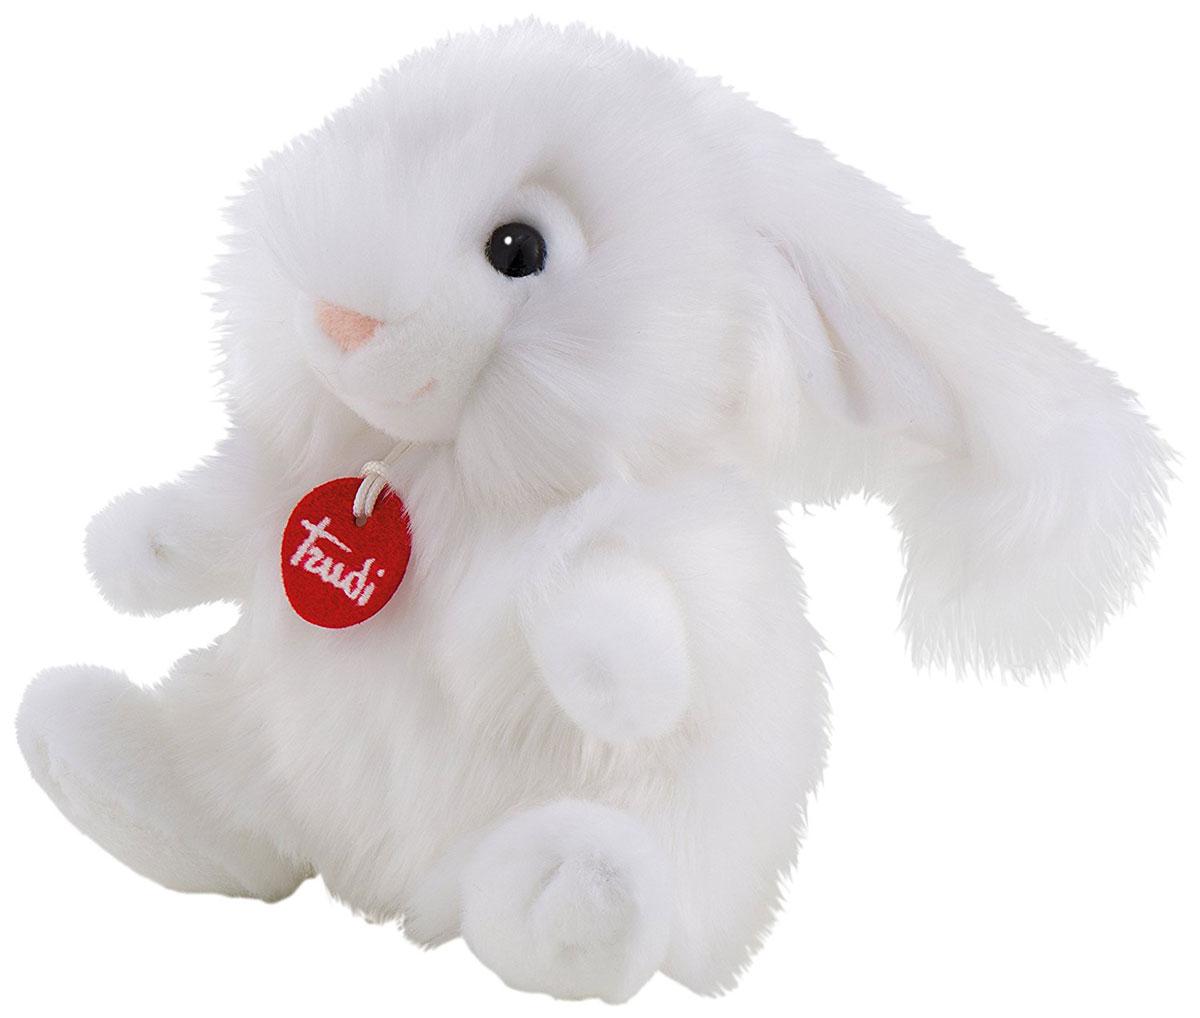 Trudi Мягкая игрушка Зайчик-пушистик 24 см мягкие игрушки trudi лайка маркус 34 см